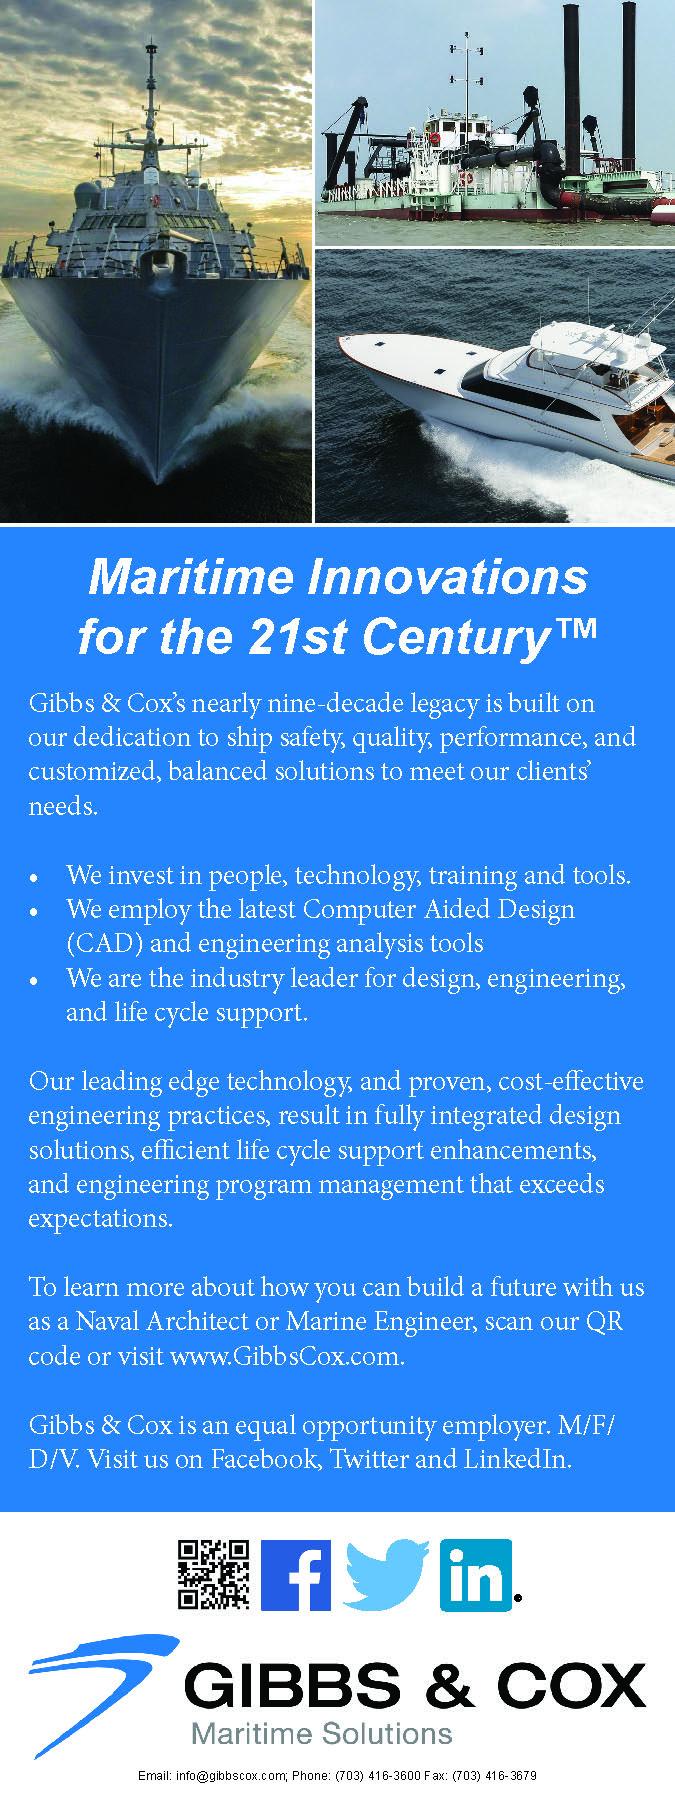 Maritime Reporter Half-Page Vert Ad 2016.jpg